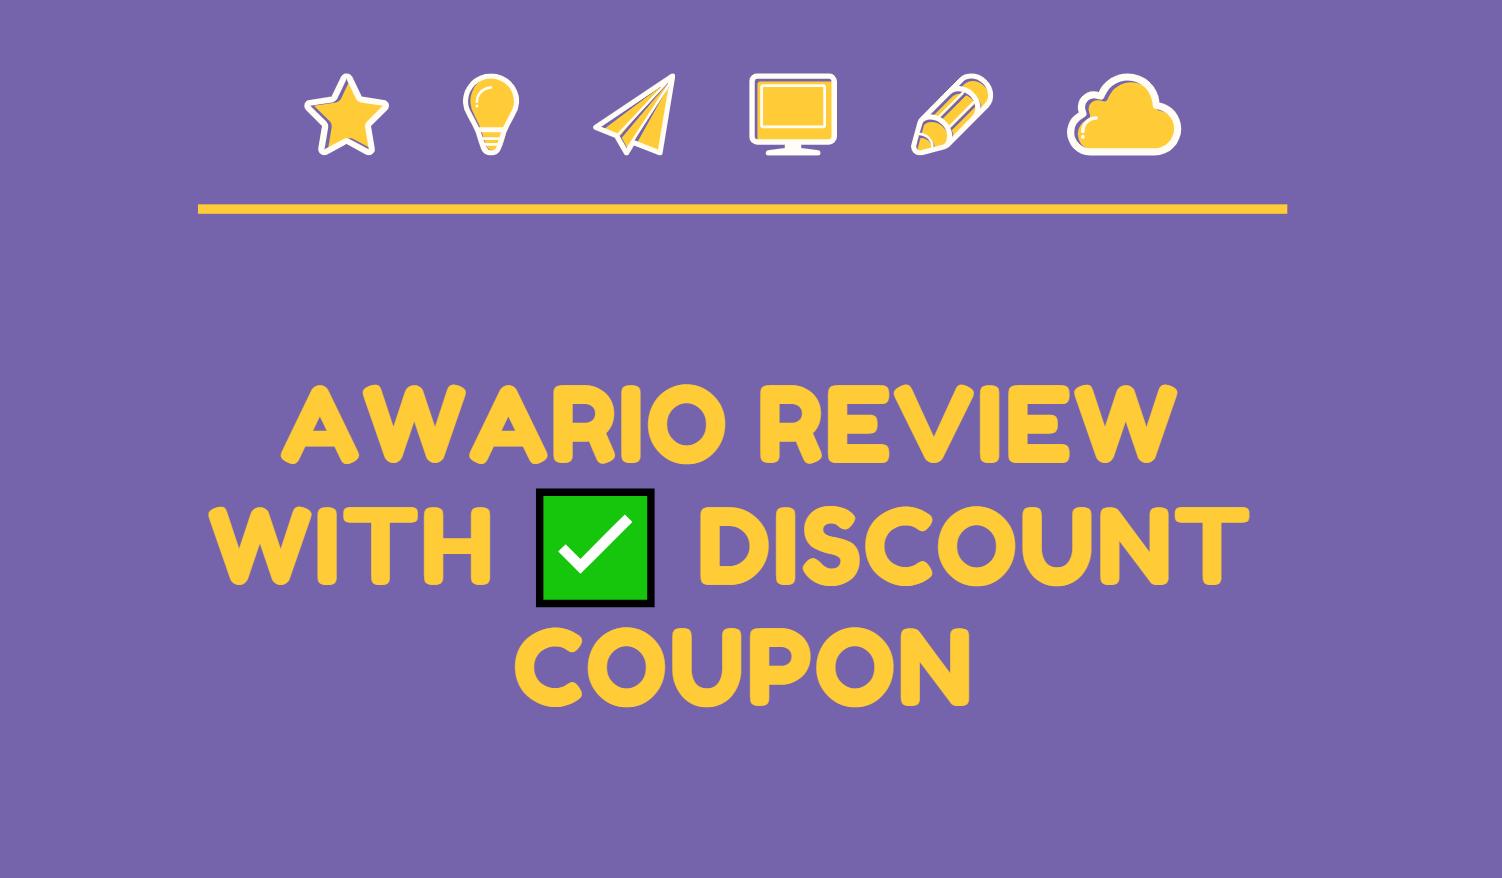 Awario discount coupons Awario reviews